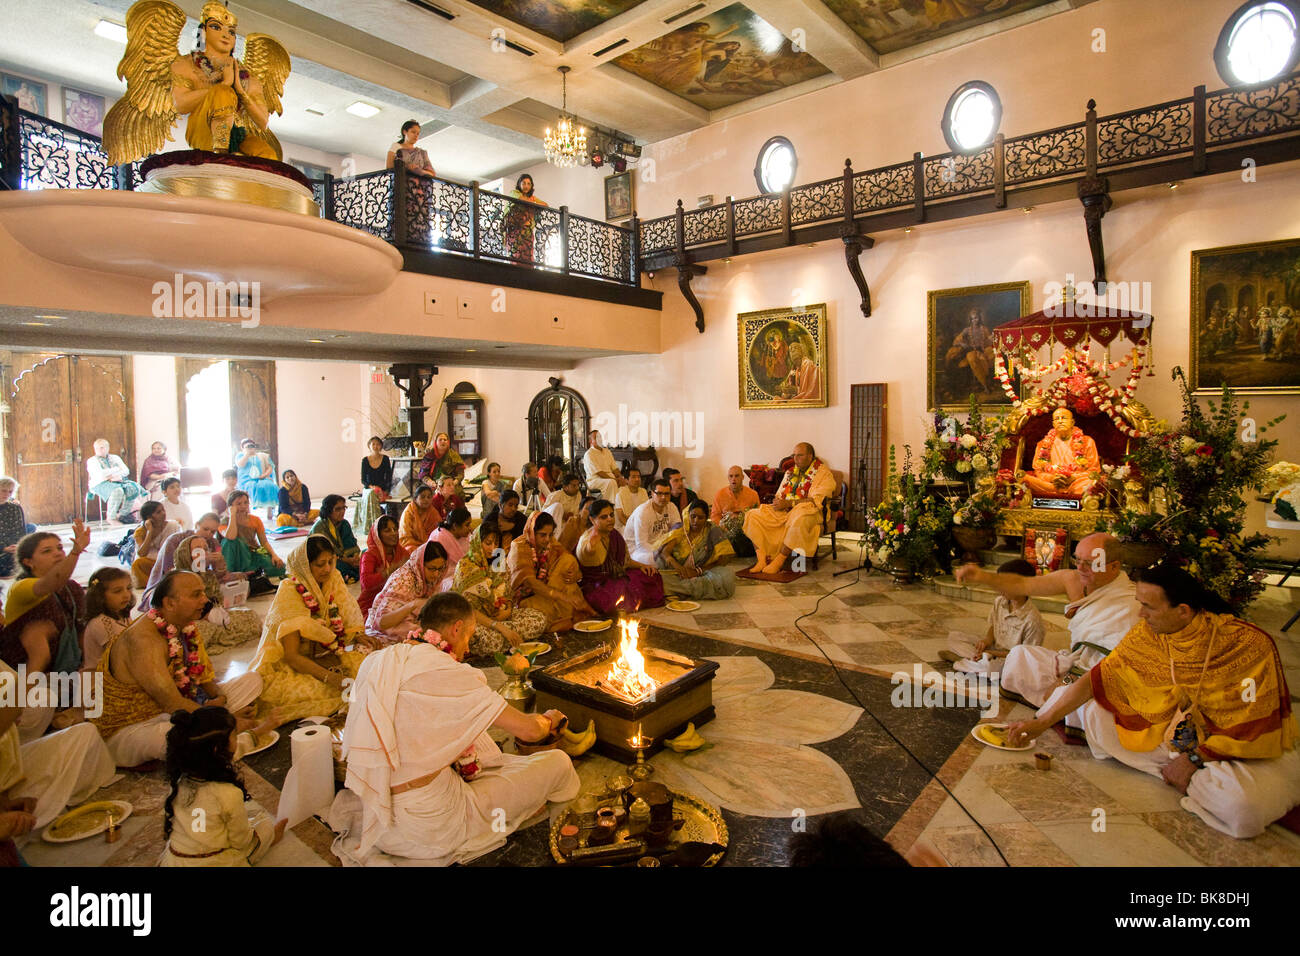 Ceremony at Hare Krishna temple in Culver City Los